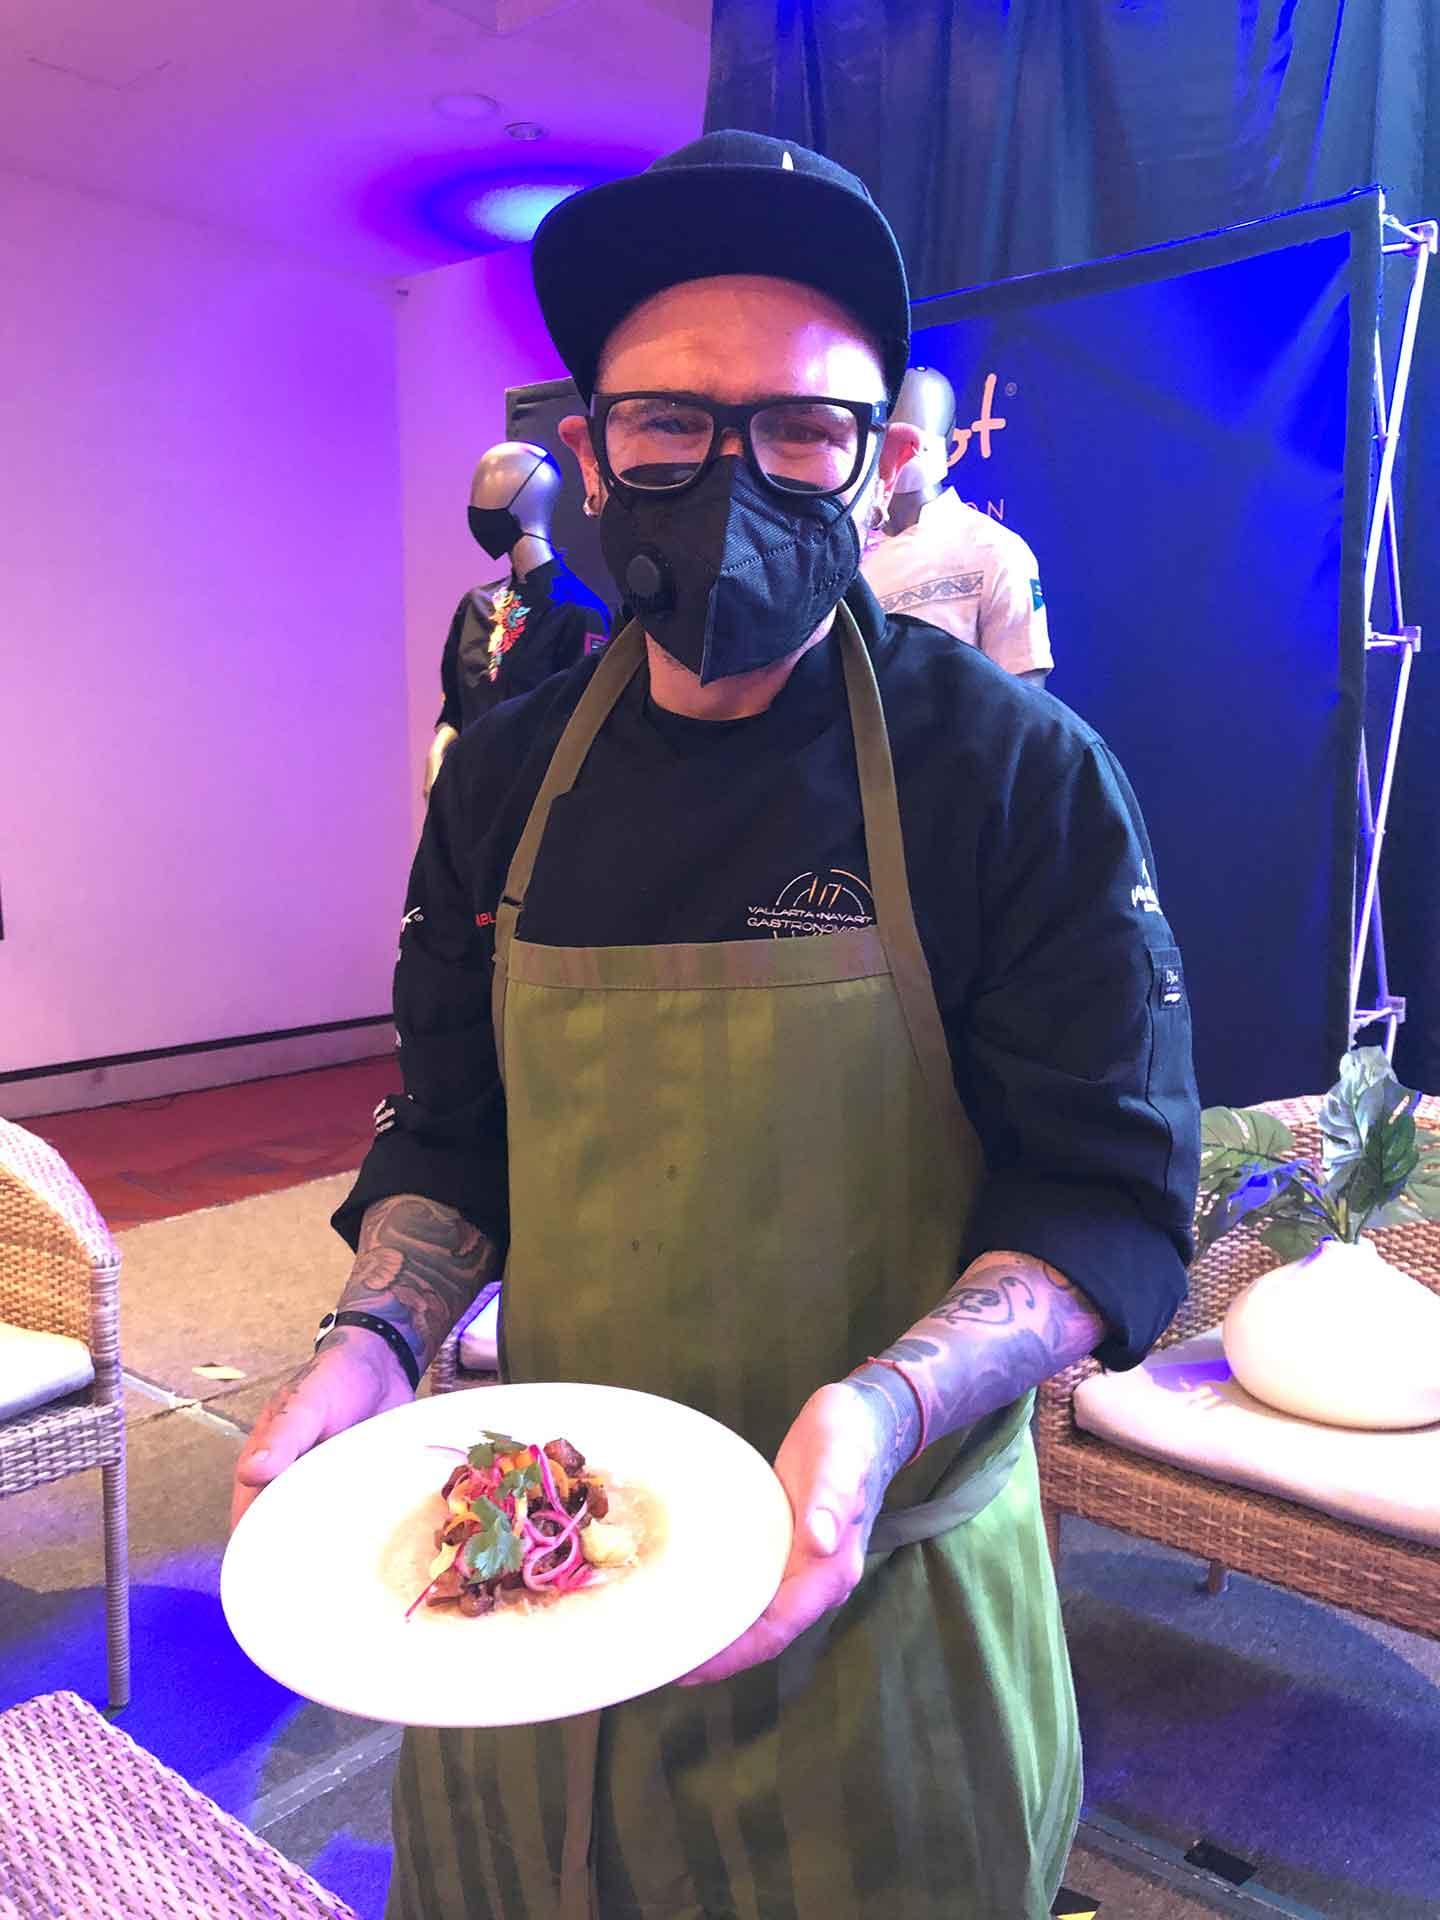 Chef Pablo Salas